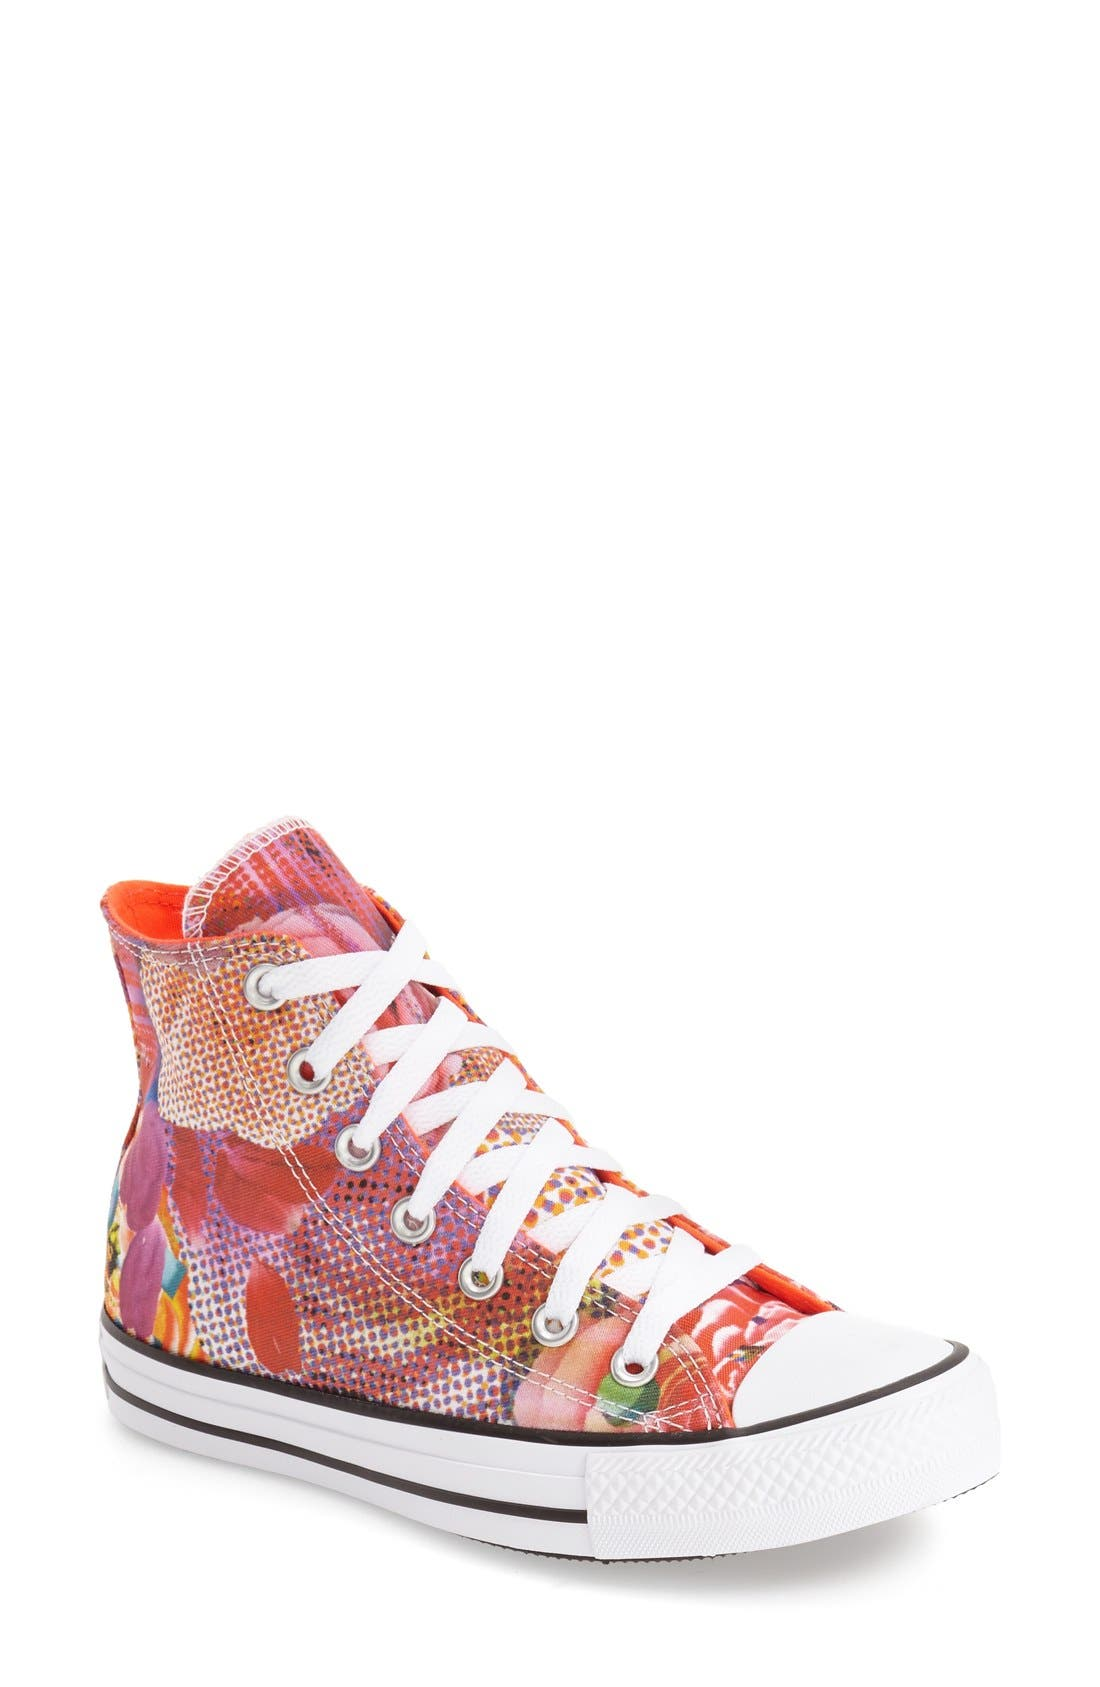 Main Image - Converse Chuck Taylor® All Star® 'Digital Floral' High Top (Women)